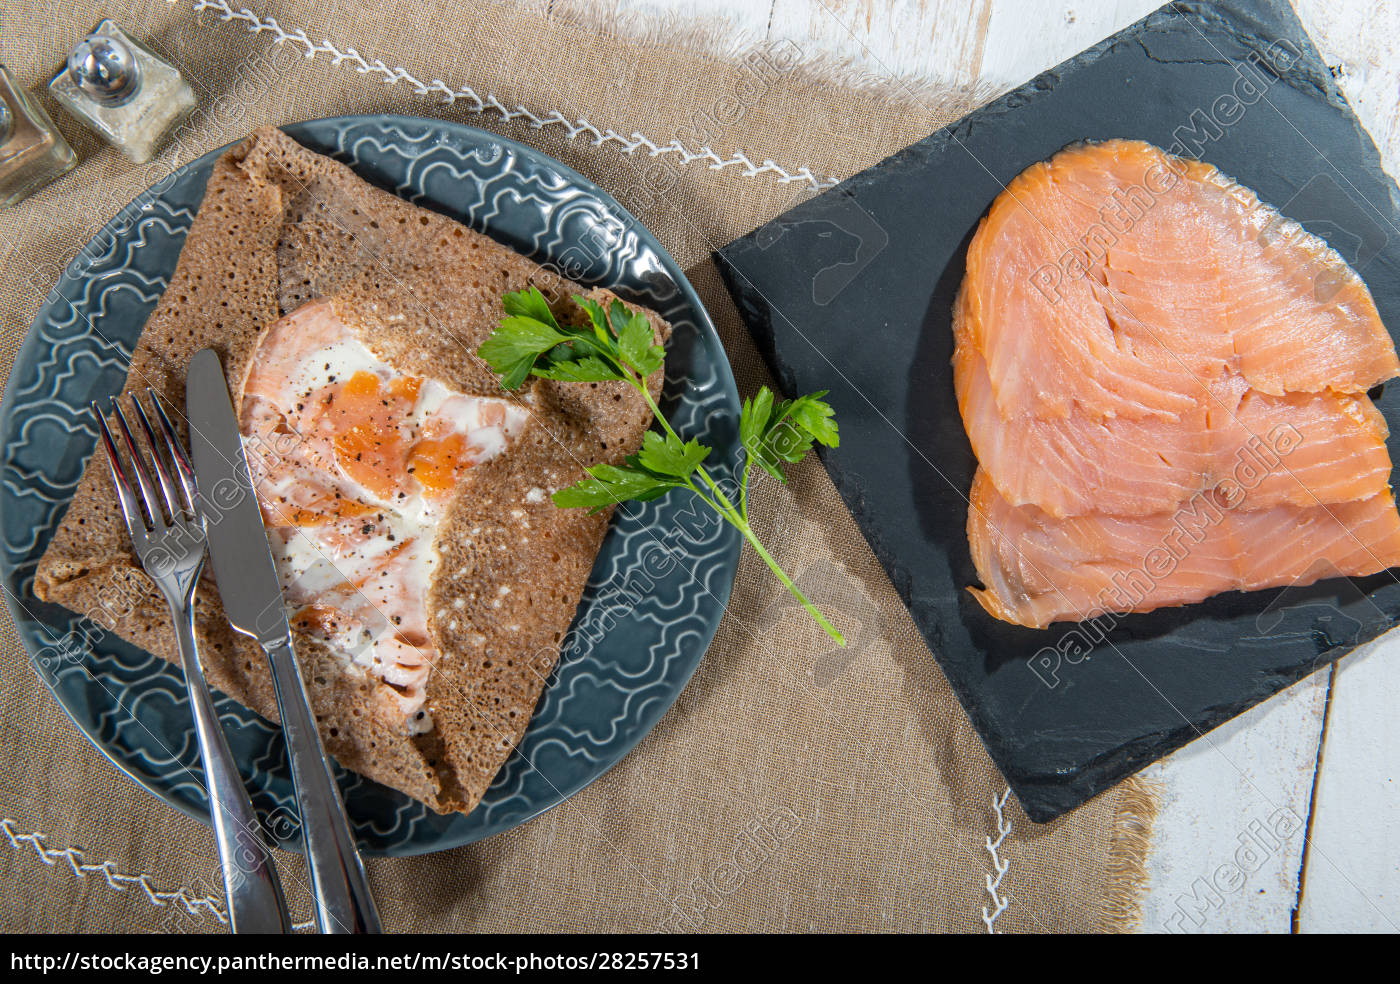 breton, crepe, with, salmon, fillets - 28257531